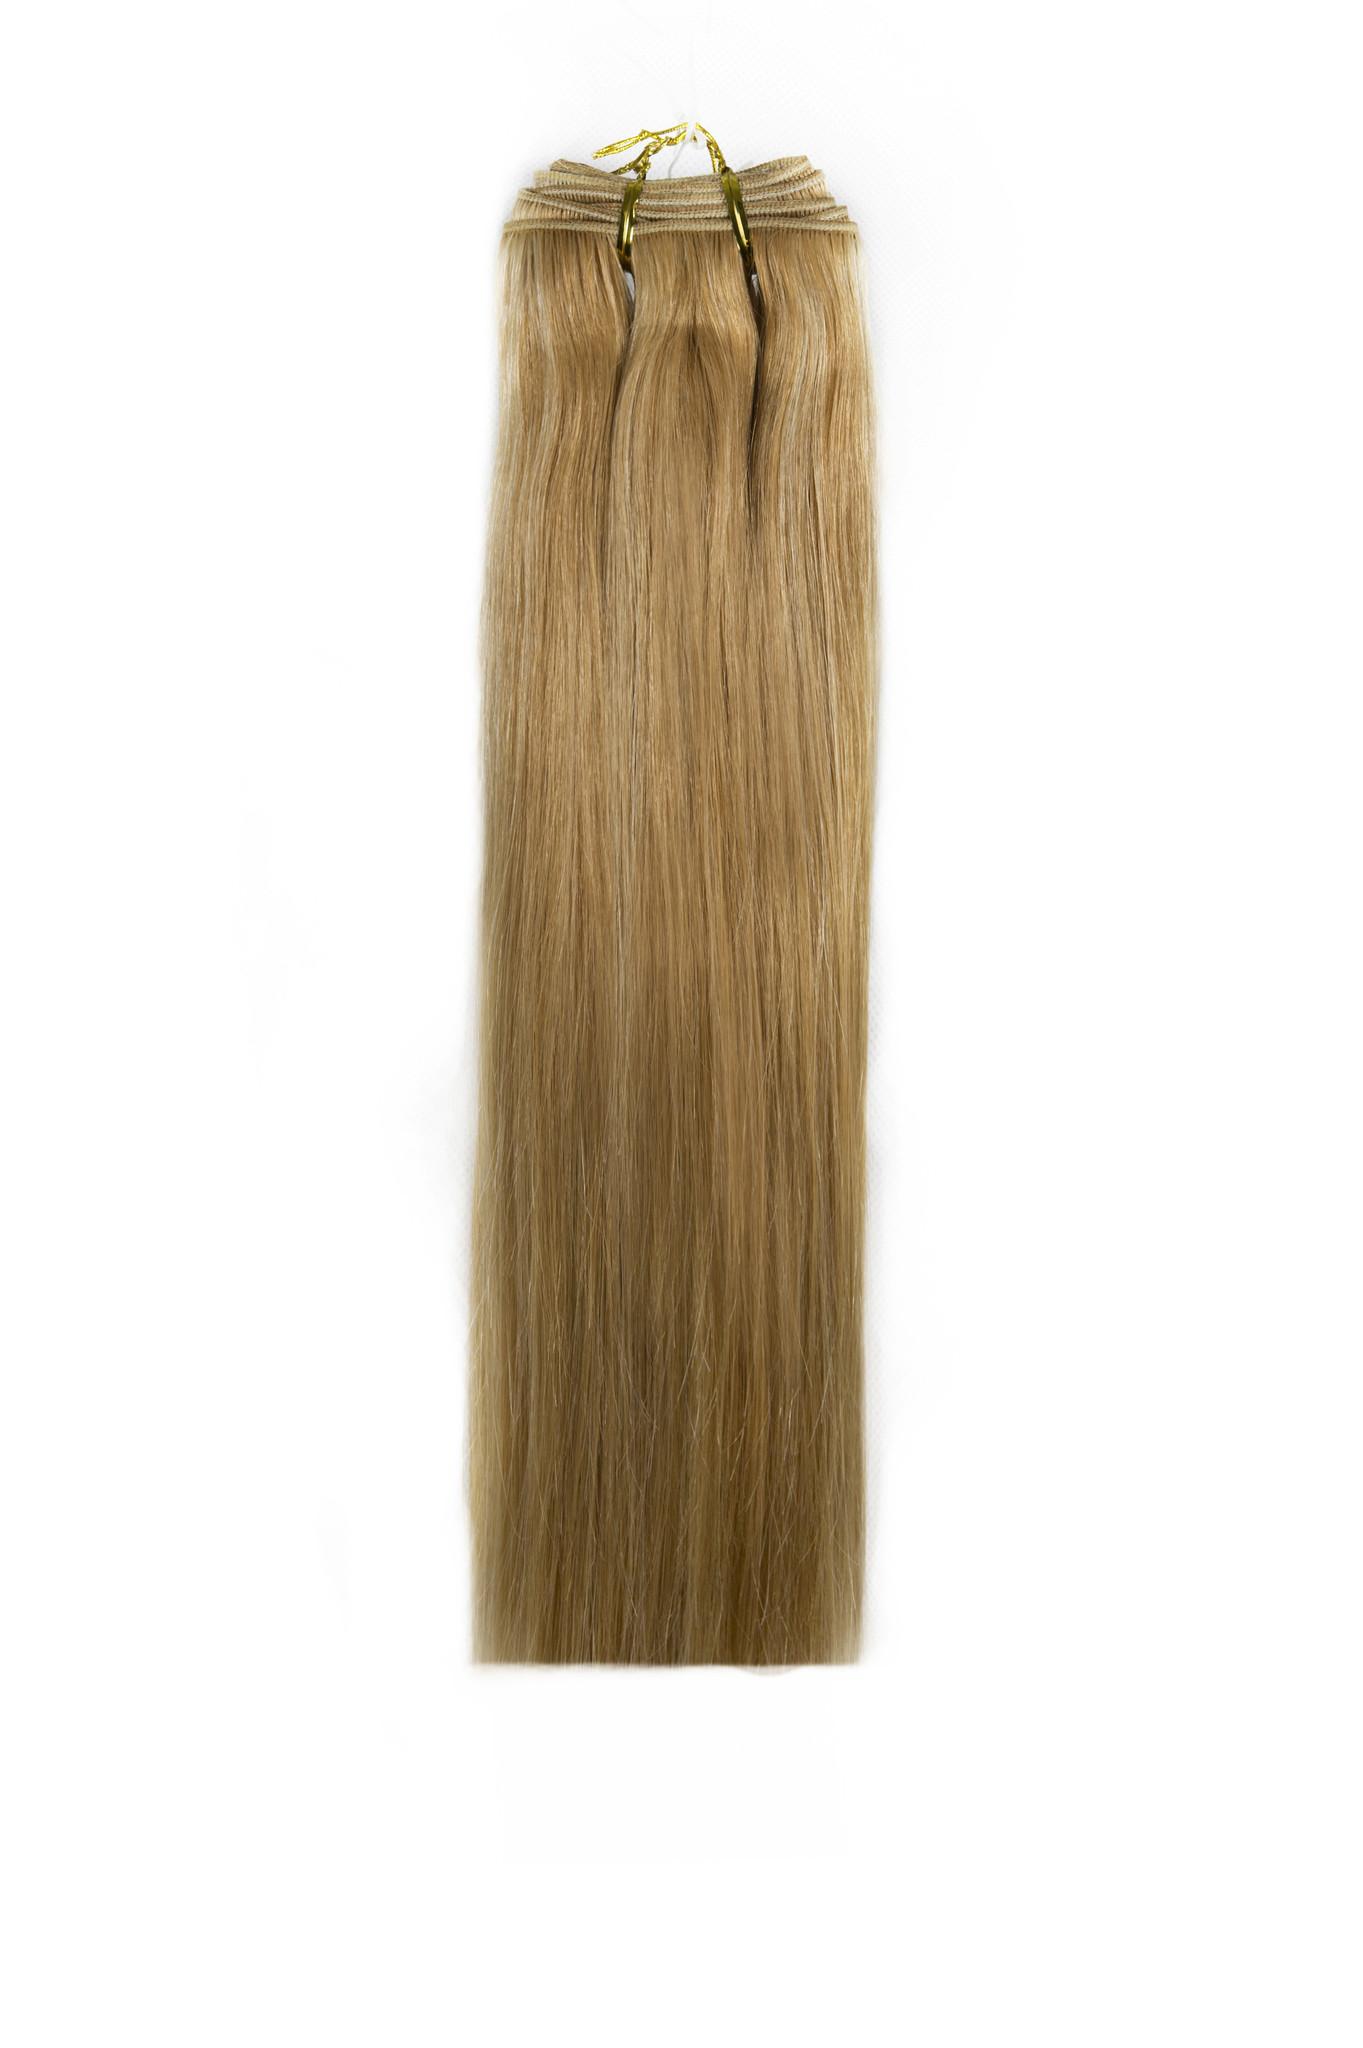 SilverFox Weave - #27/613 Dark Blonde/Light Blonde